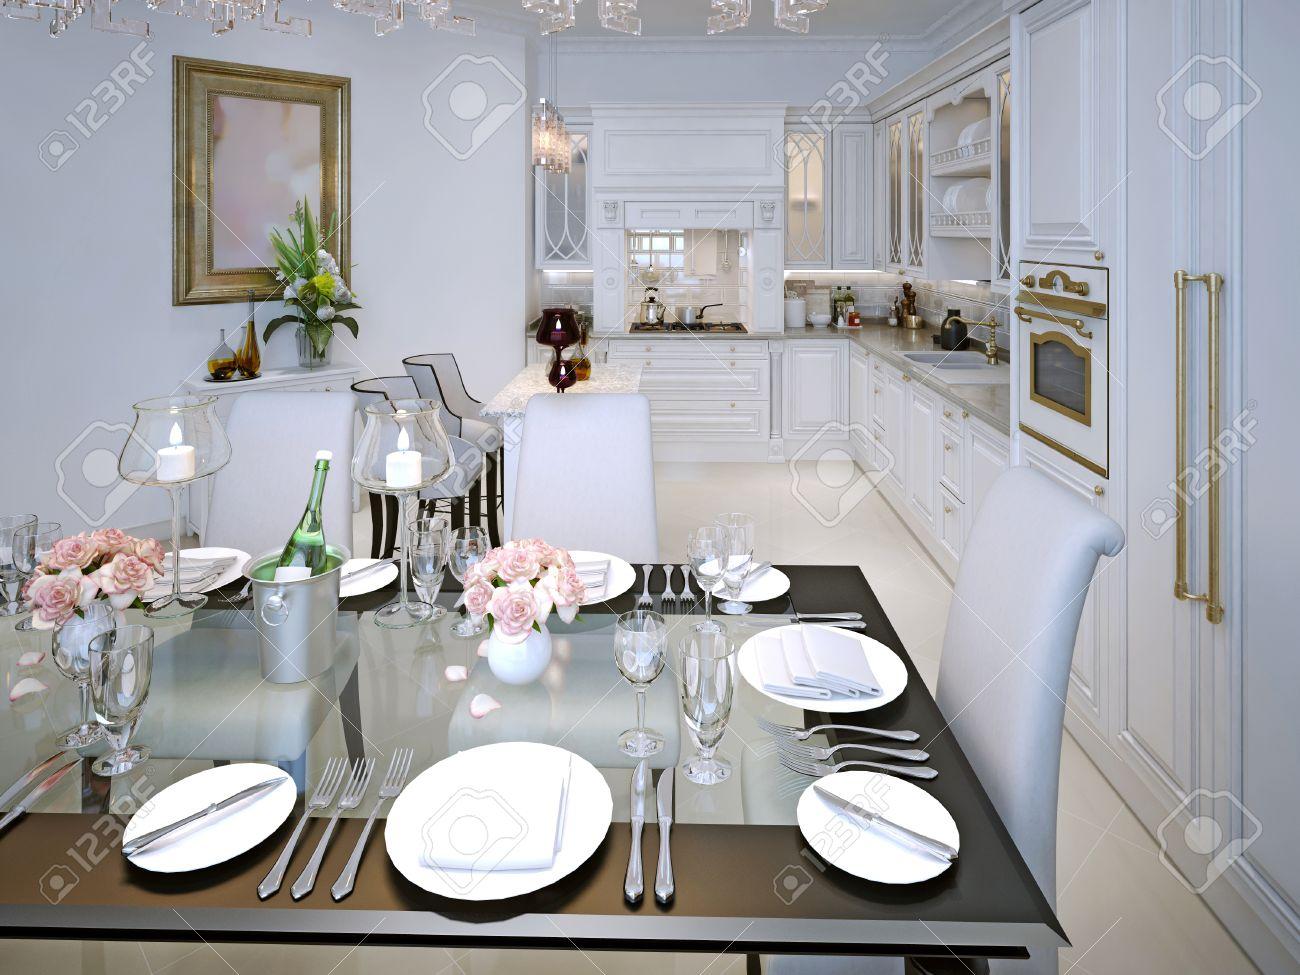 Beautiful Cucina Sala Pranzo Images - Ideas & Design 2017 ...